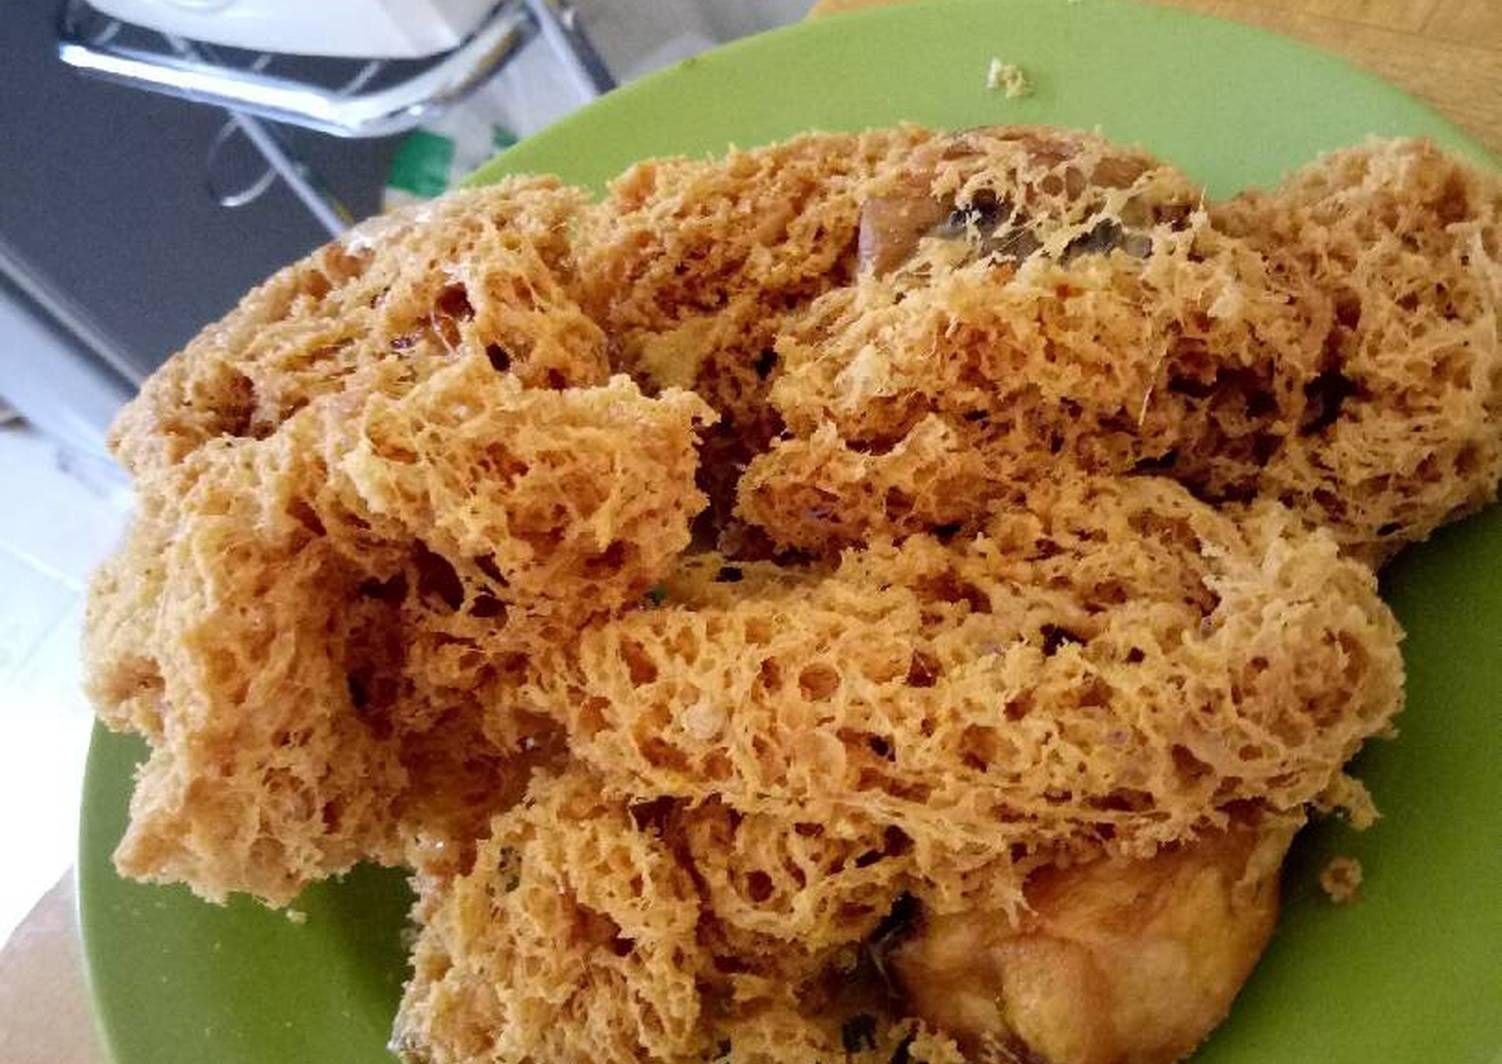 Resep Ayam Kremes Ala Ayam Goreng Suharti Oleh Laylla Gama Resep Resep Ayam Ayam Goreng Resep